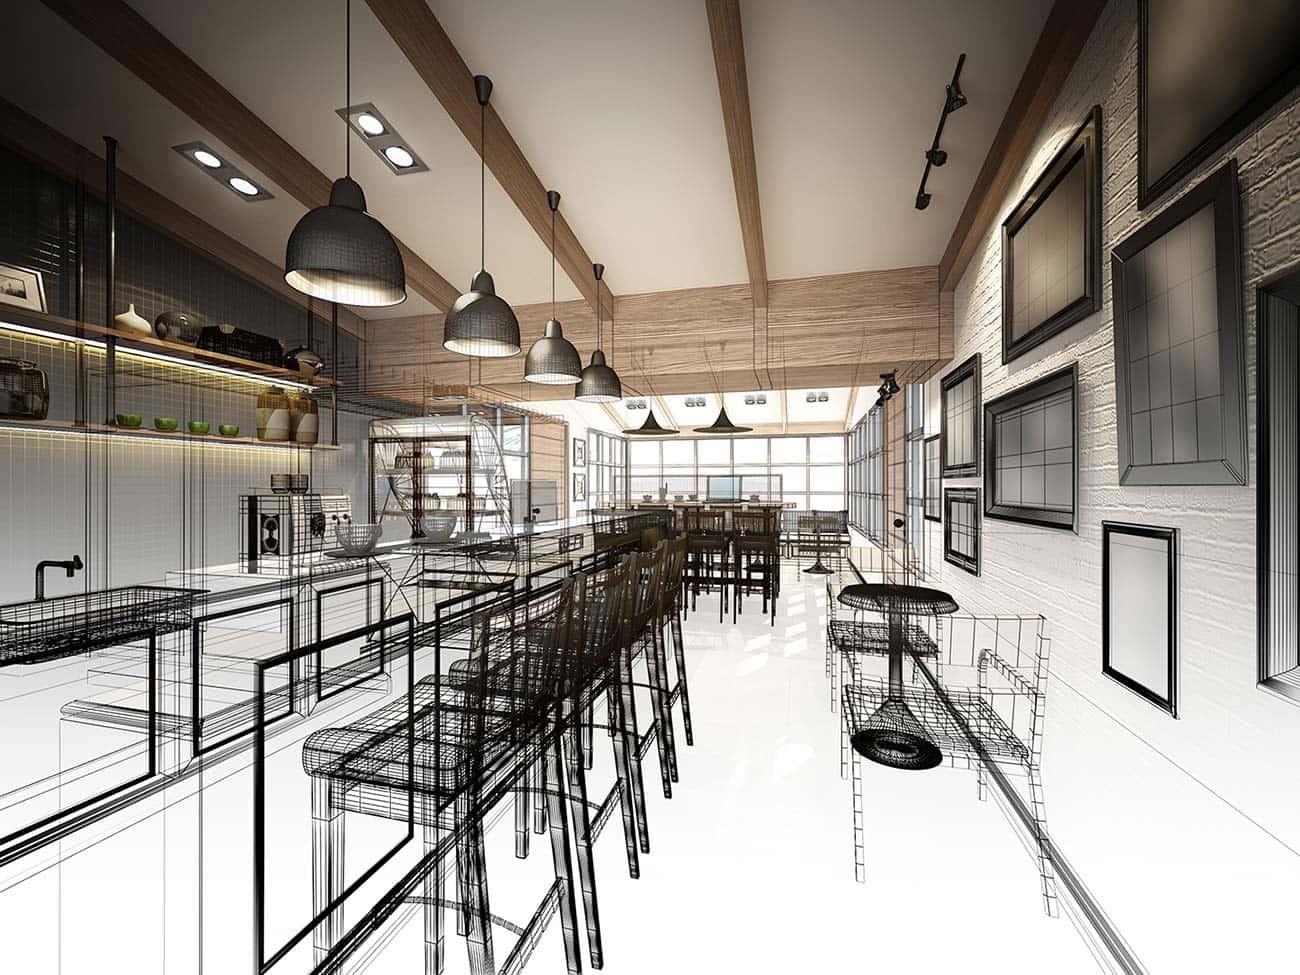 L'Atelier SD - Cuisine, Cuisine